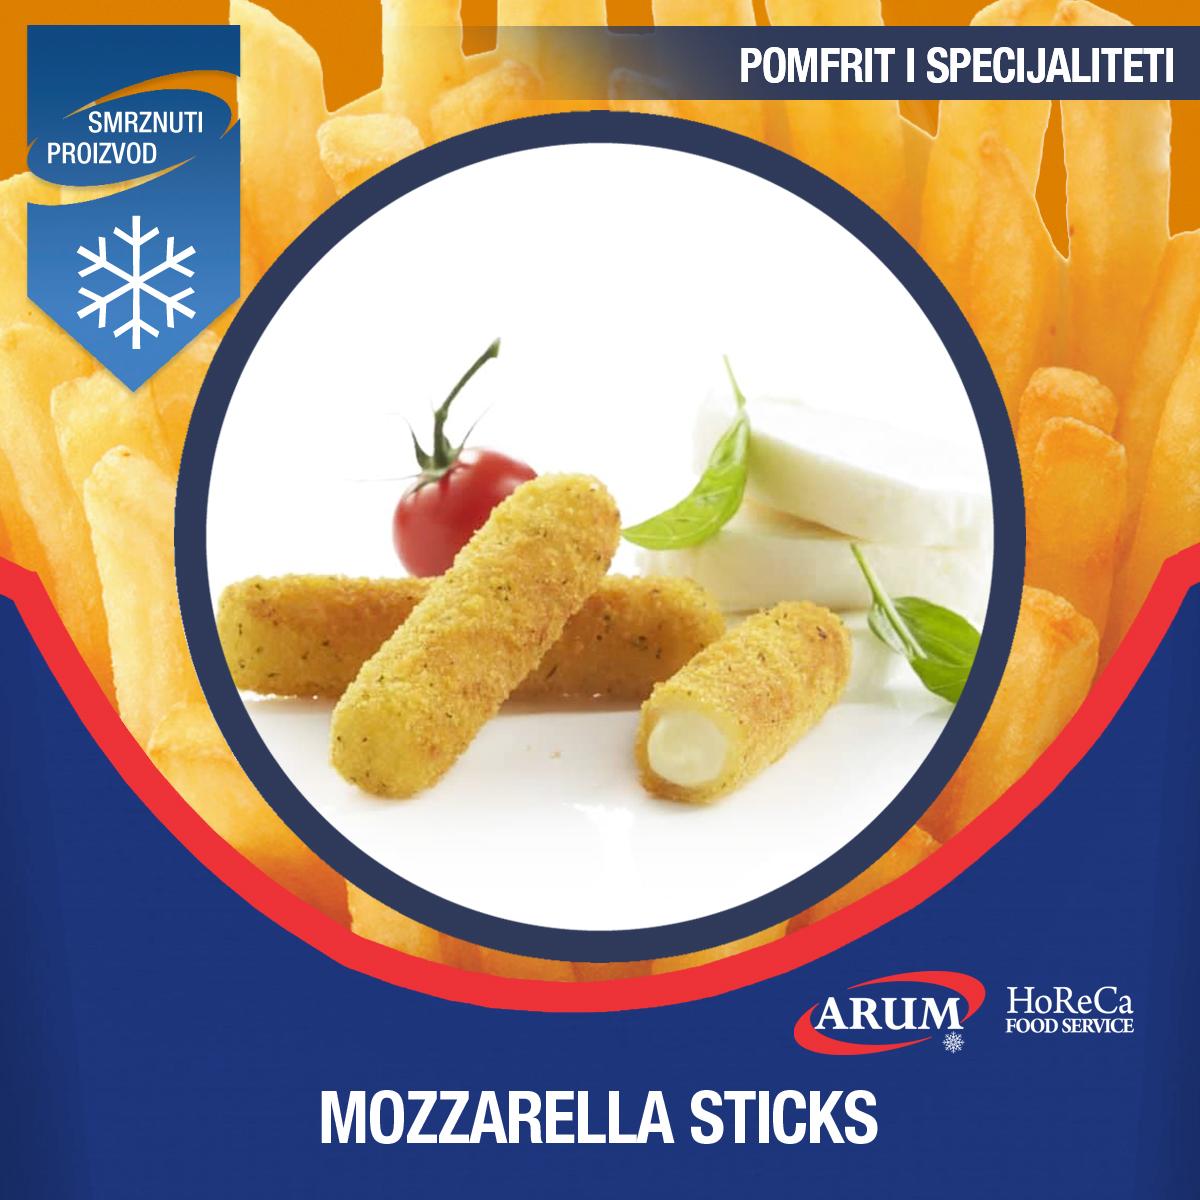 Mozzarella sticks 6x1 kg